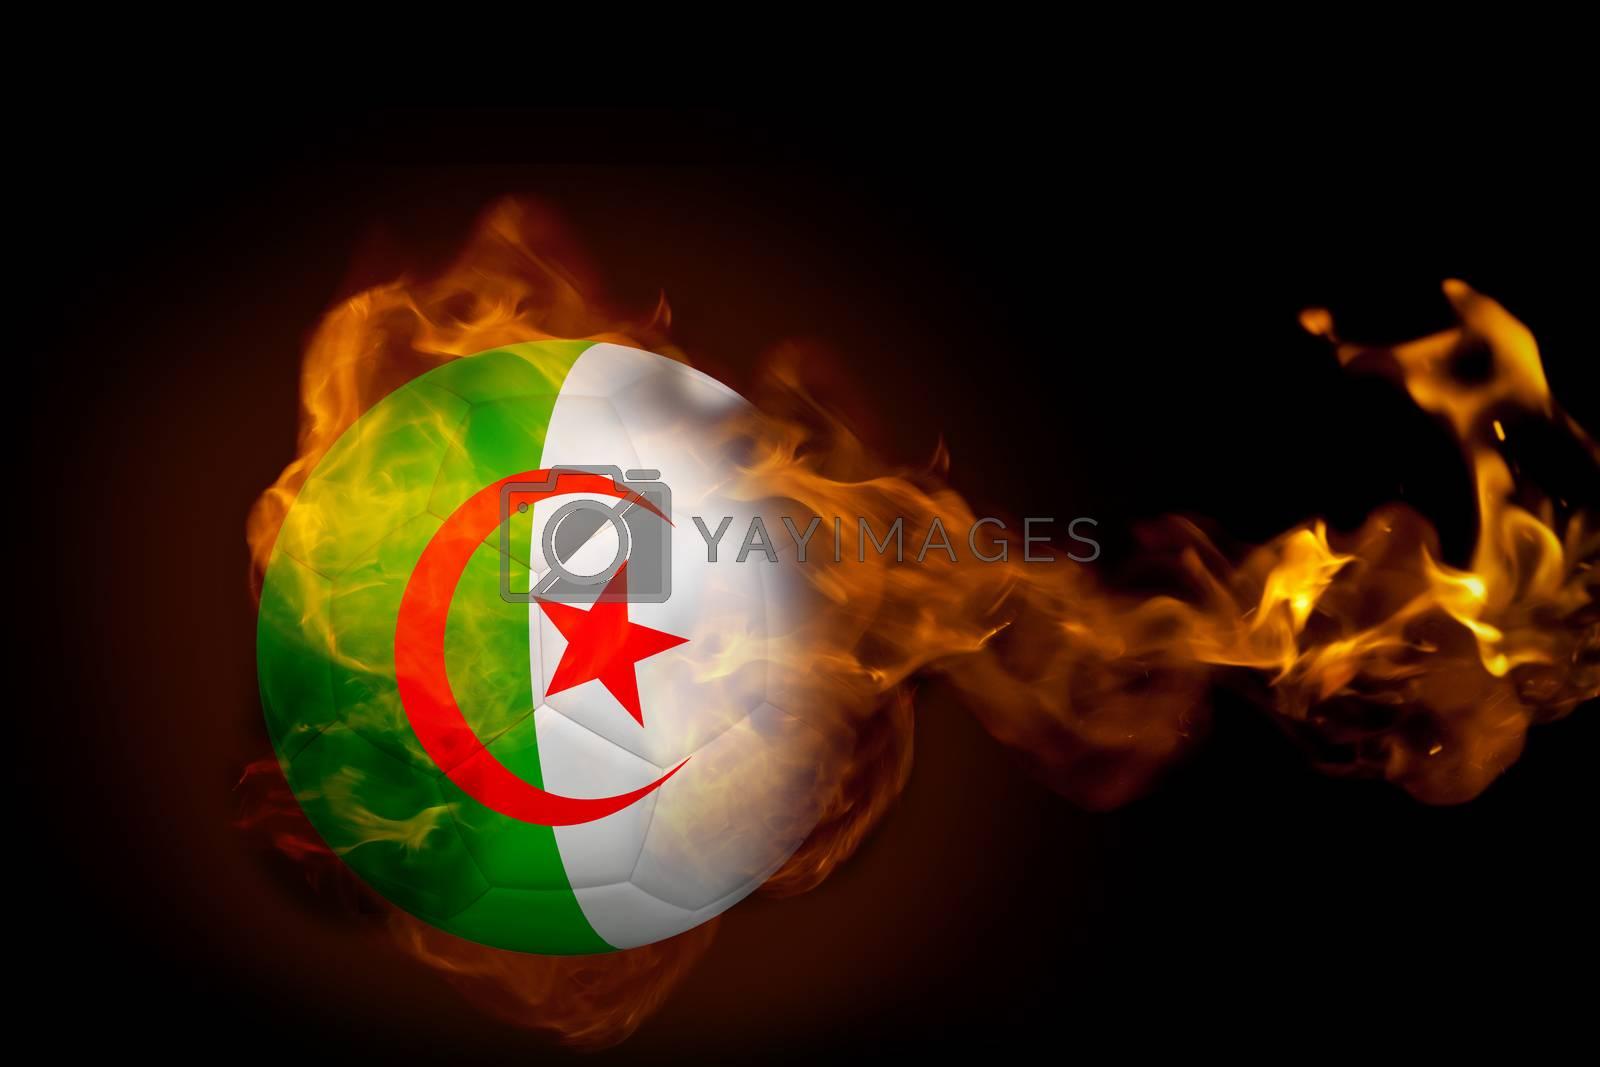 Fire surrounding algeria ball by Wavebreakmedia